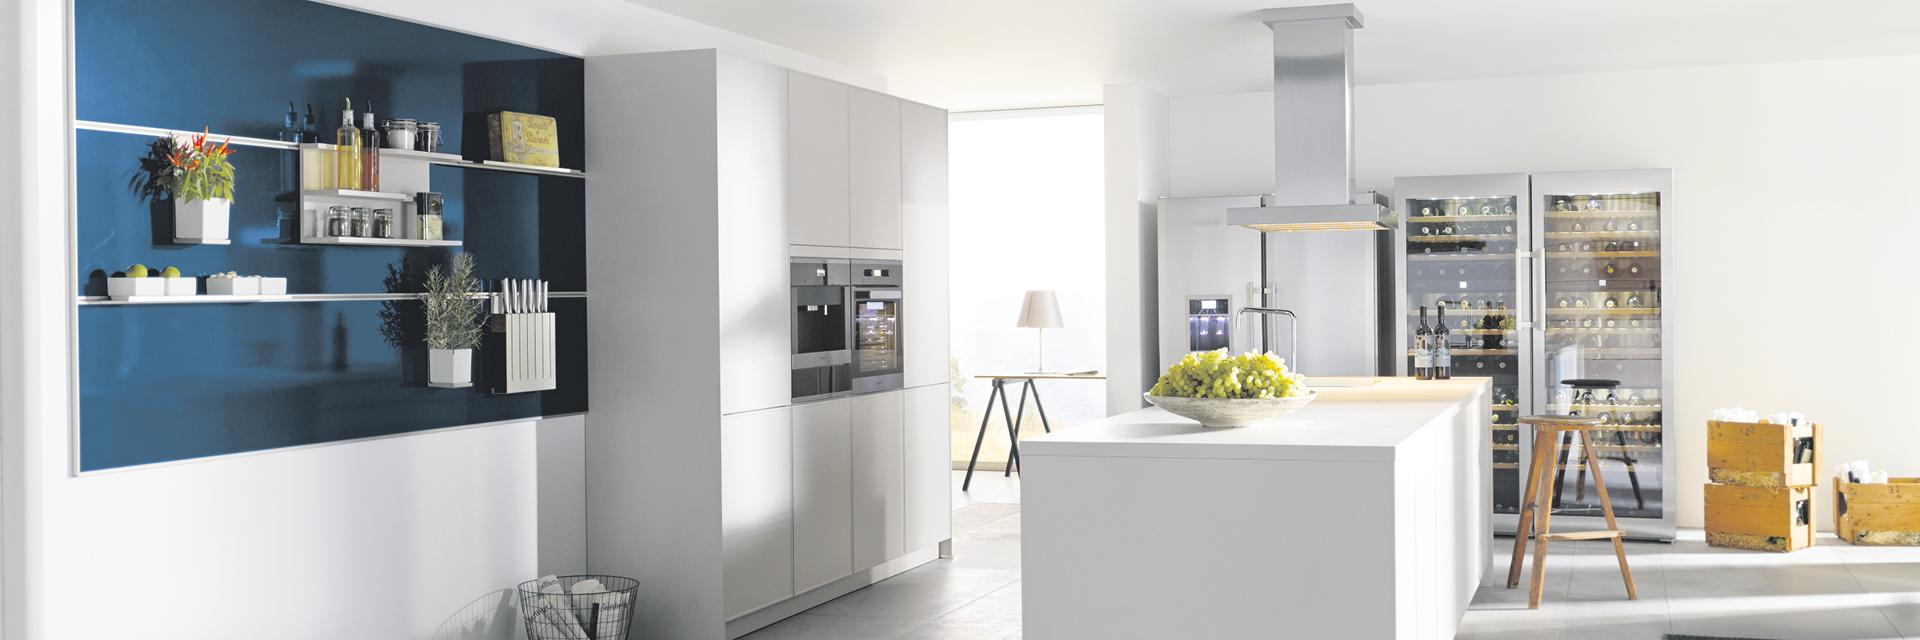 minimalismus in der k che moderne k chen entdecken. Black Bedroom Furniture Sets. Home Design Ideas